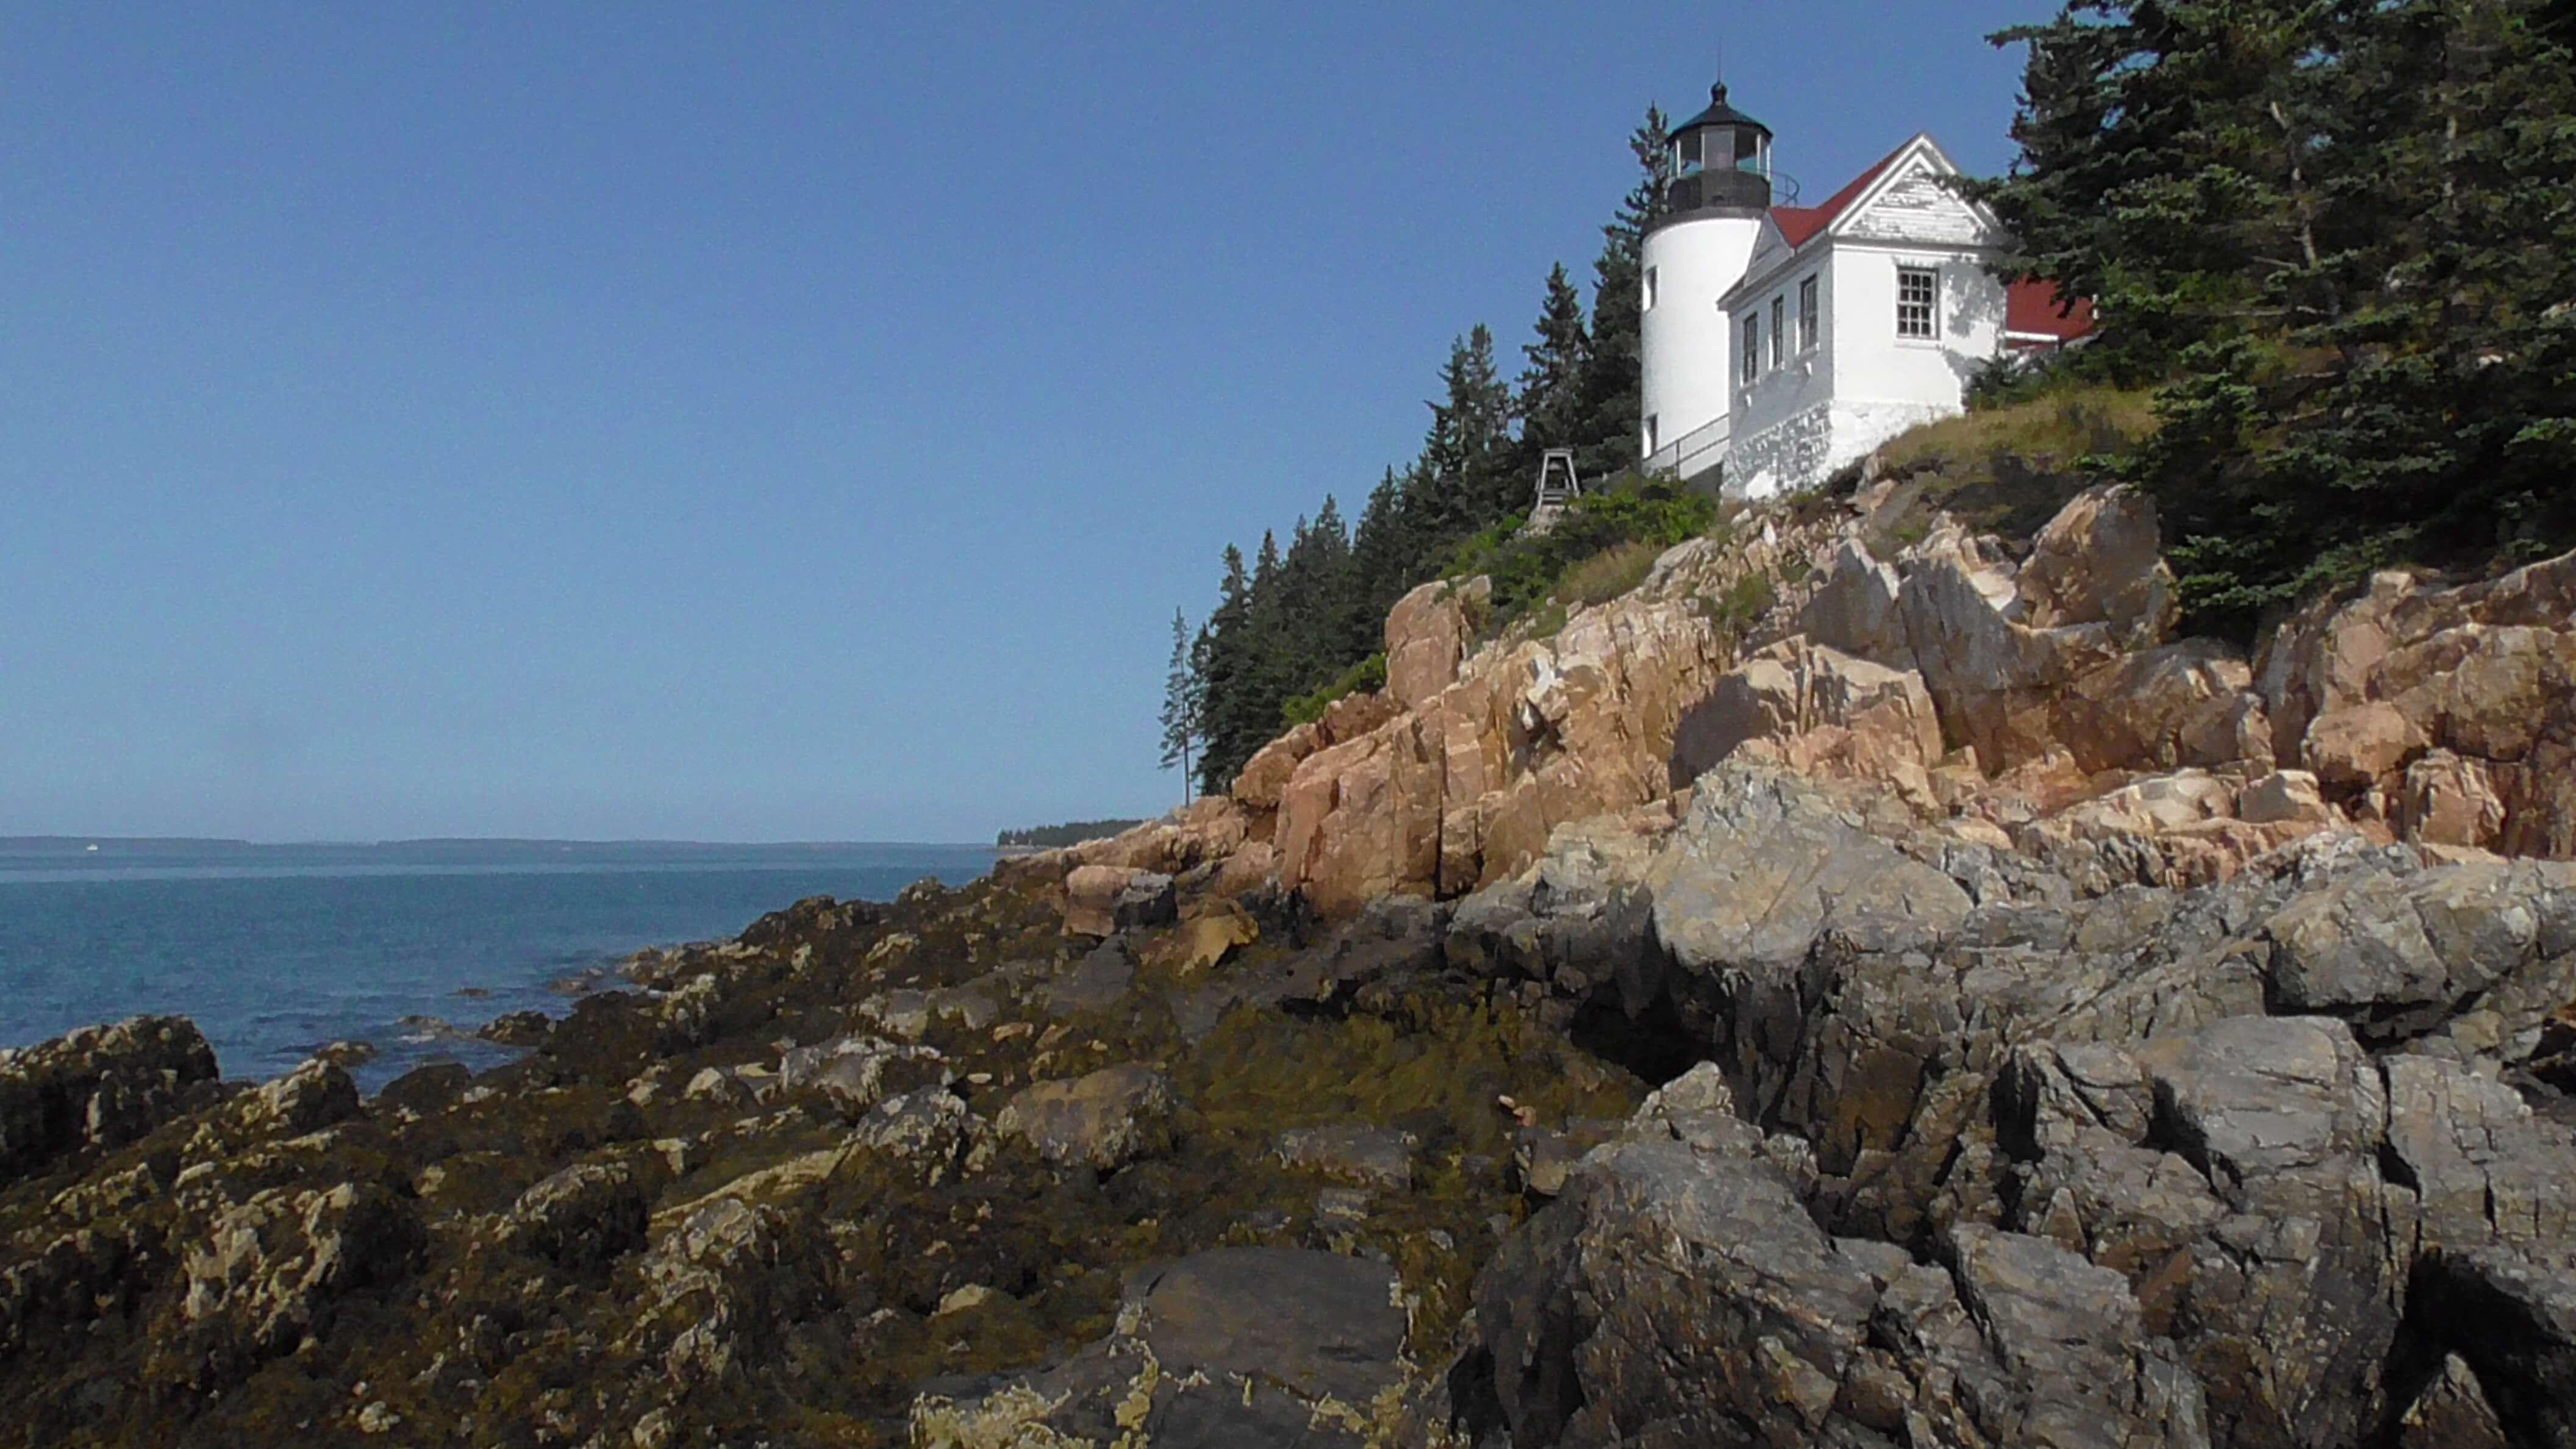 Bass Harbor Light Station, Acadia National Park, Maine